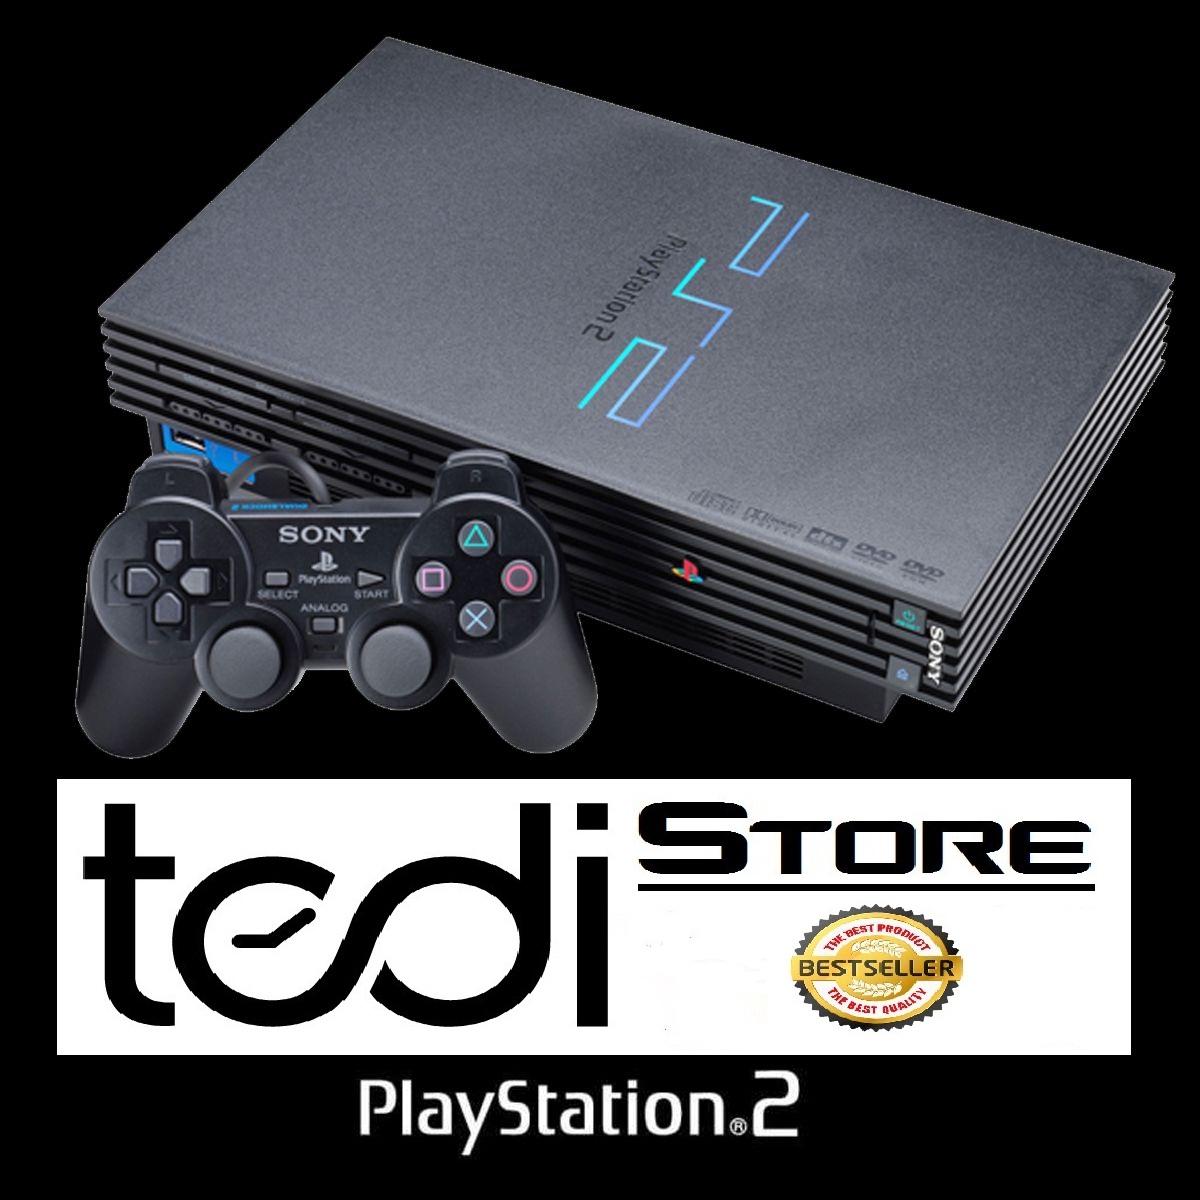 Jual Paket Komplit Sony Playstation 2 Ps2 Hardisk Eksternal 40gb External Fullgame Tedi Store Tokopedia